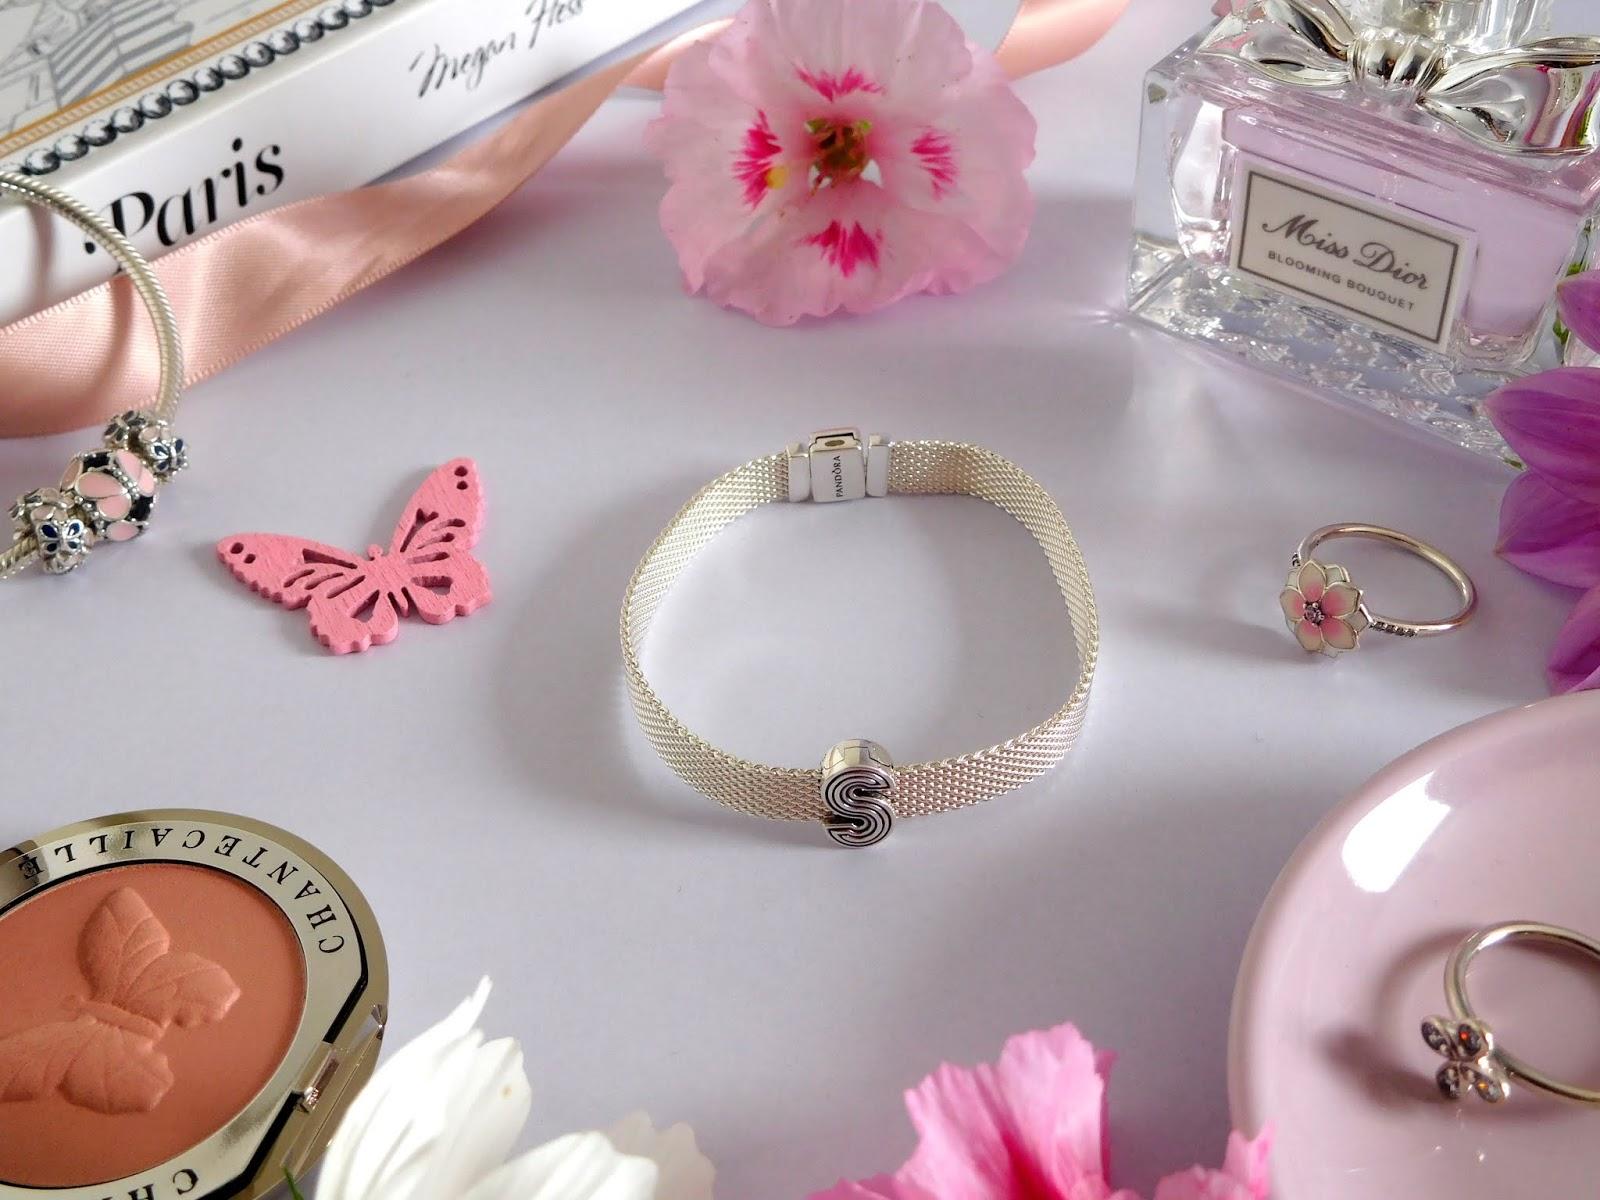 Pandora Reflexions Mesh Bracelet and Reflexions Le